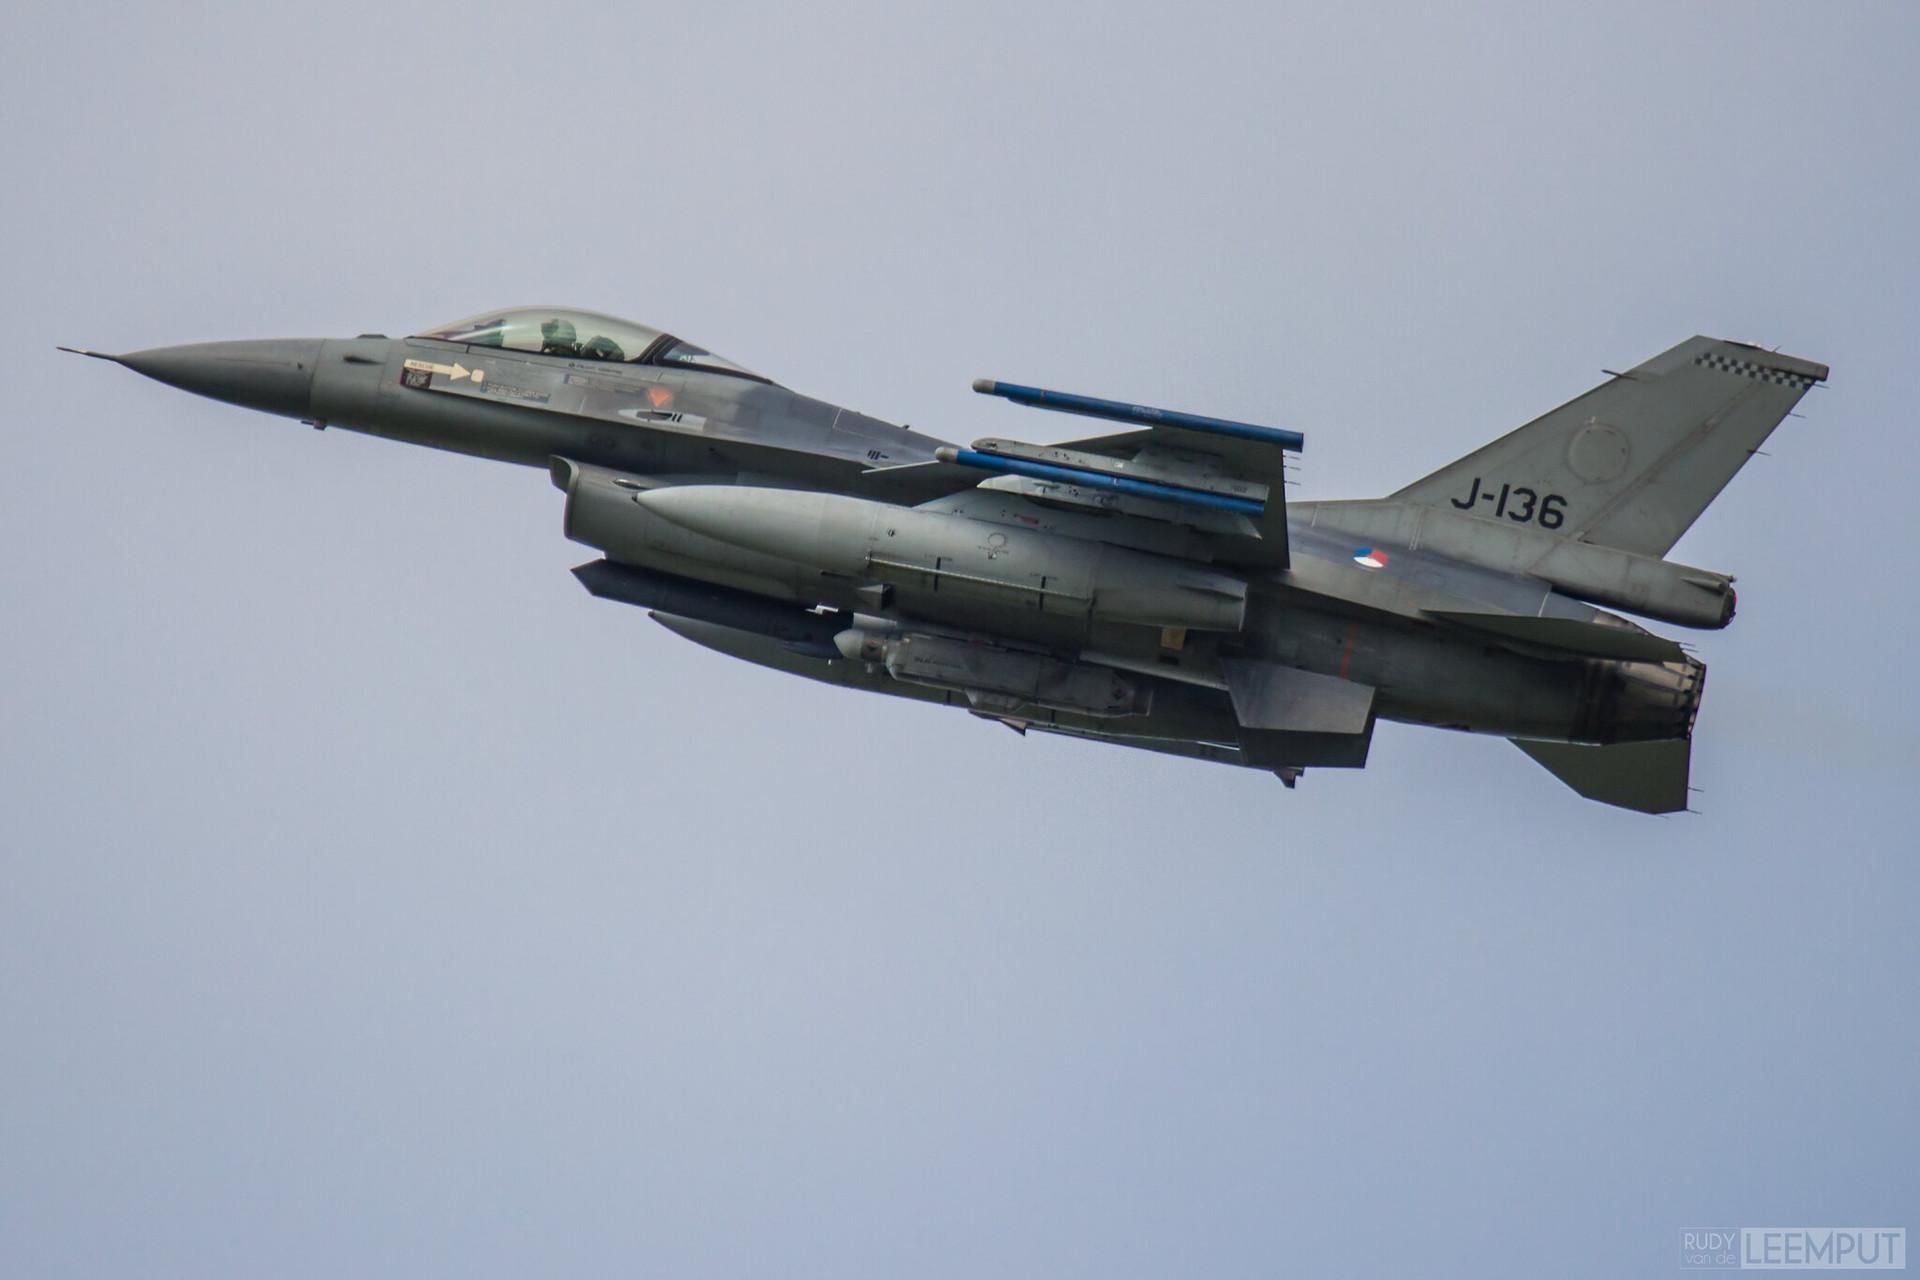 J-136   Build: 1987 - Lockheed F-16 A Fighting Falcon